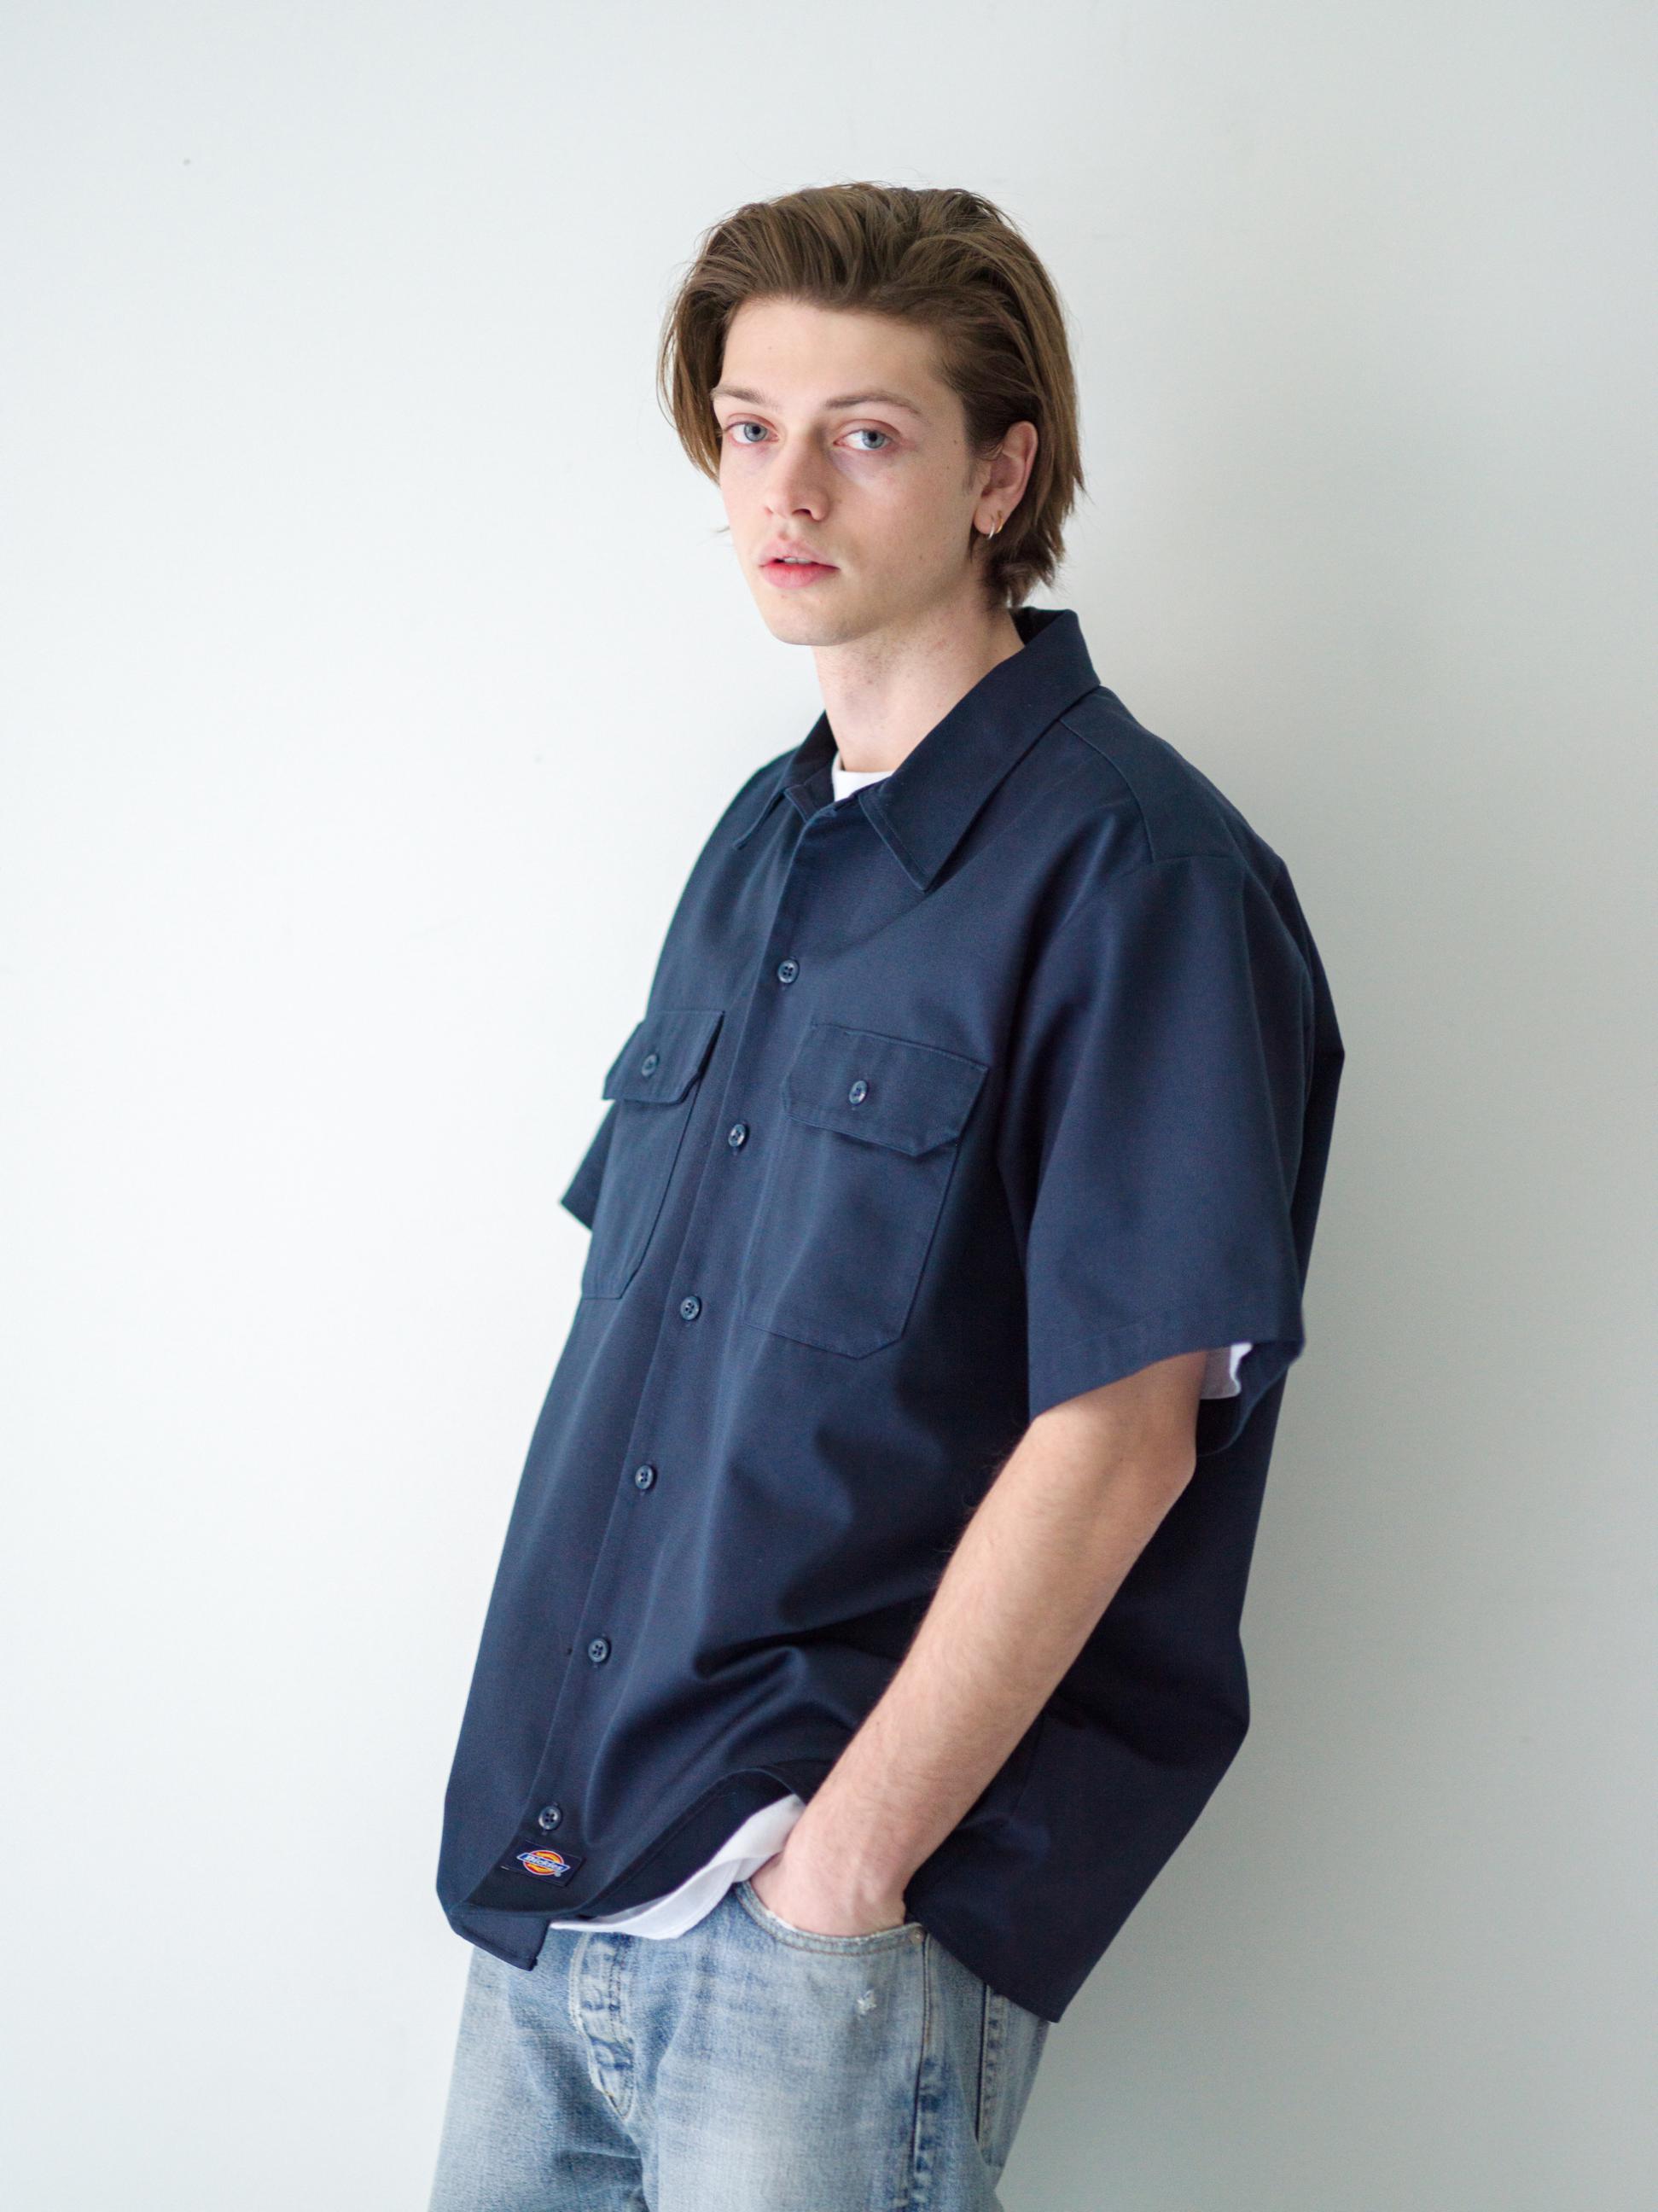 22) Shirts ¥17,600  Inner ¥8,800  Pants ¥44,000